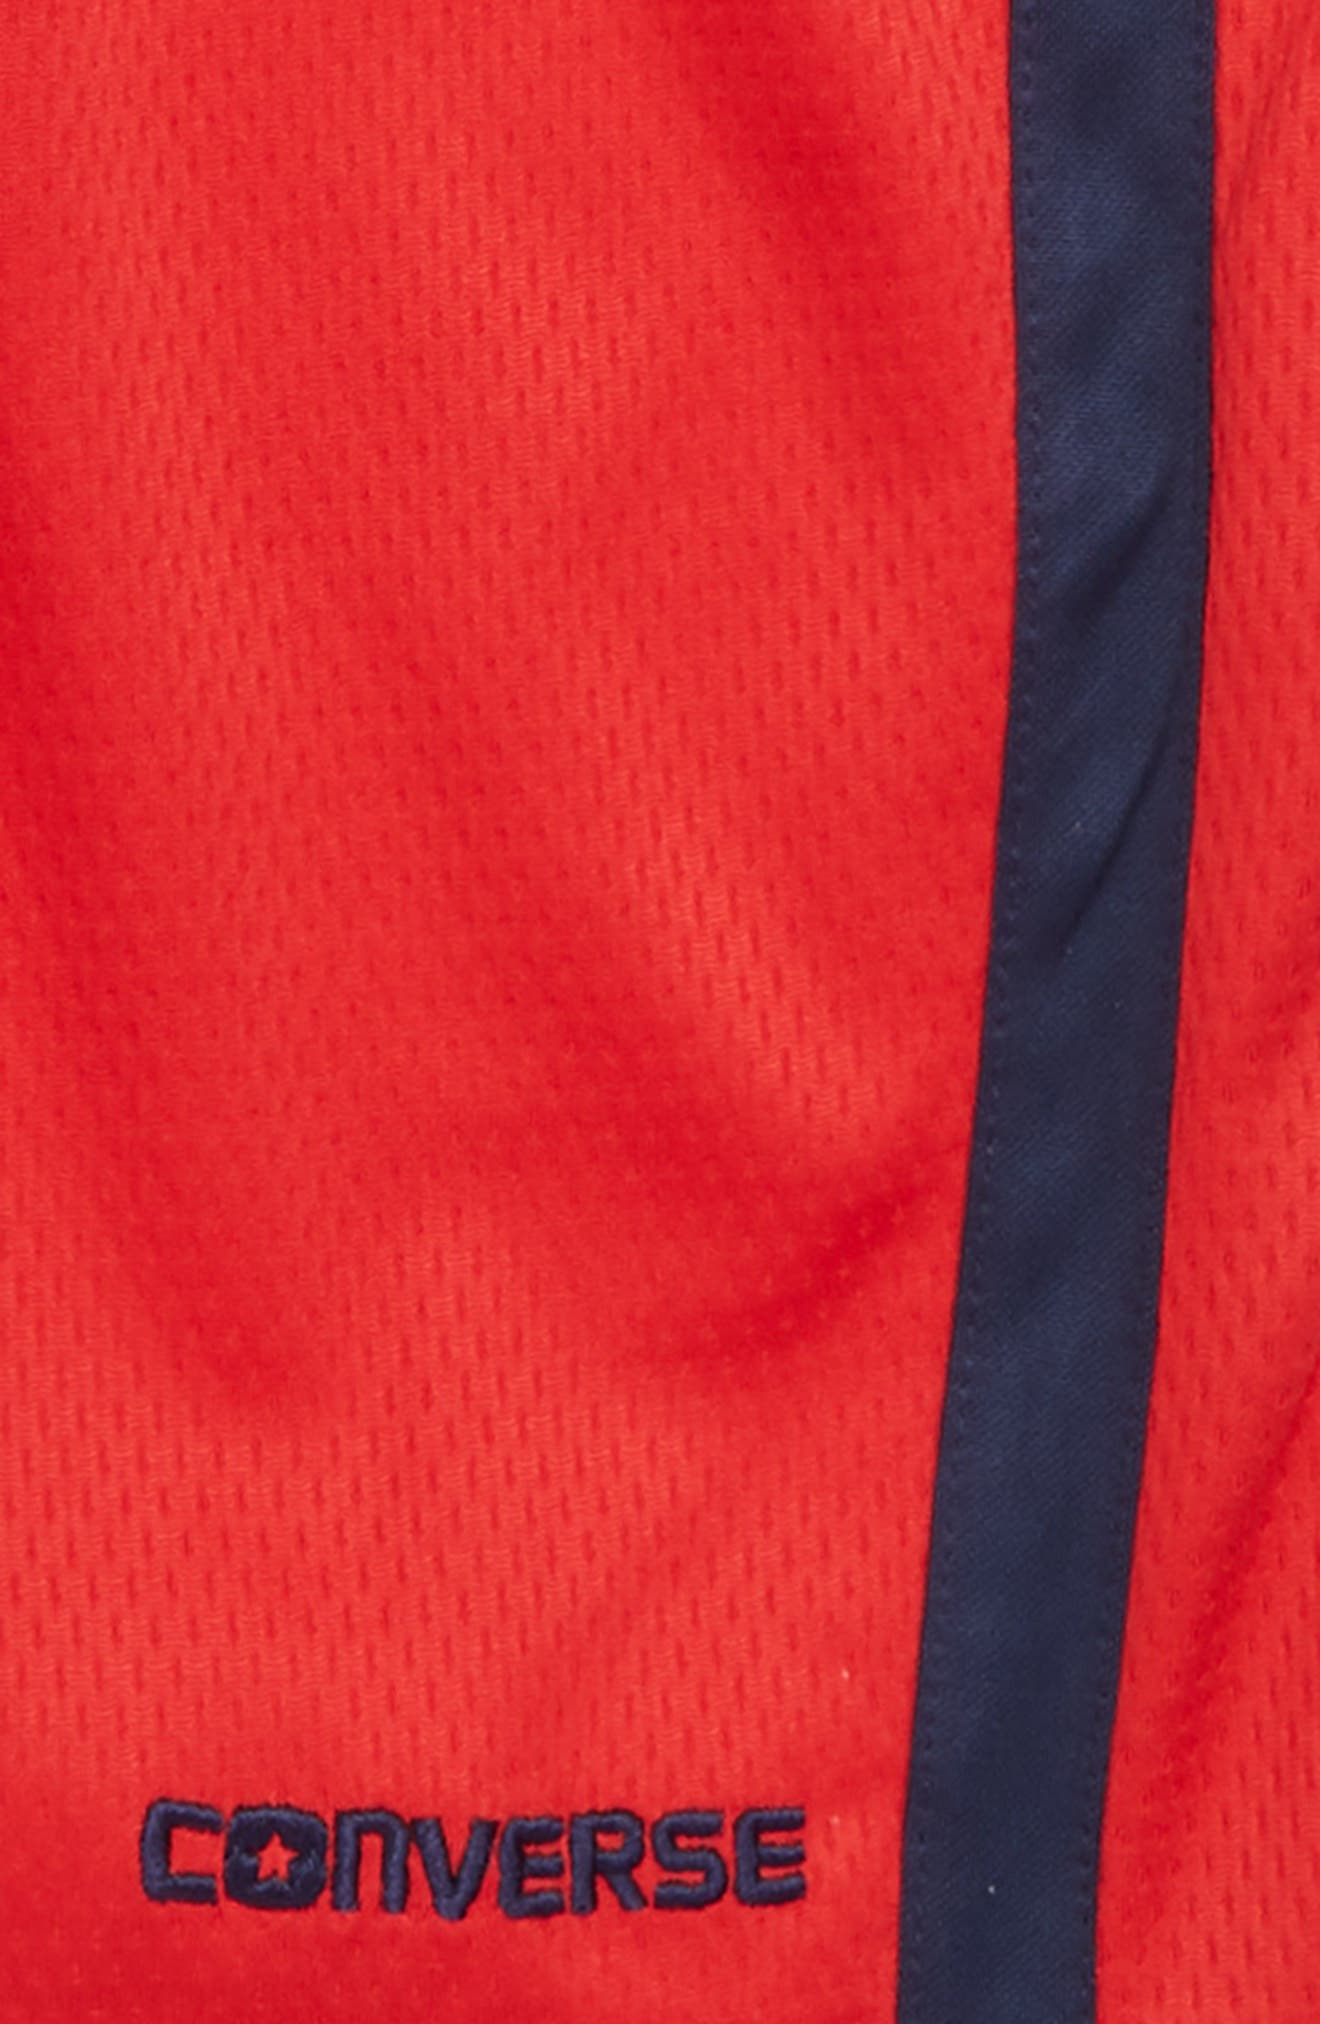 Stripe Mesh Shorts,                             Alternate thumbnail 2, color,                             Converse Red